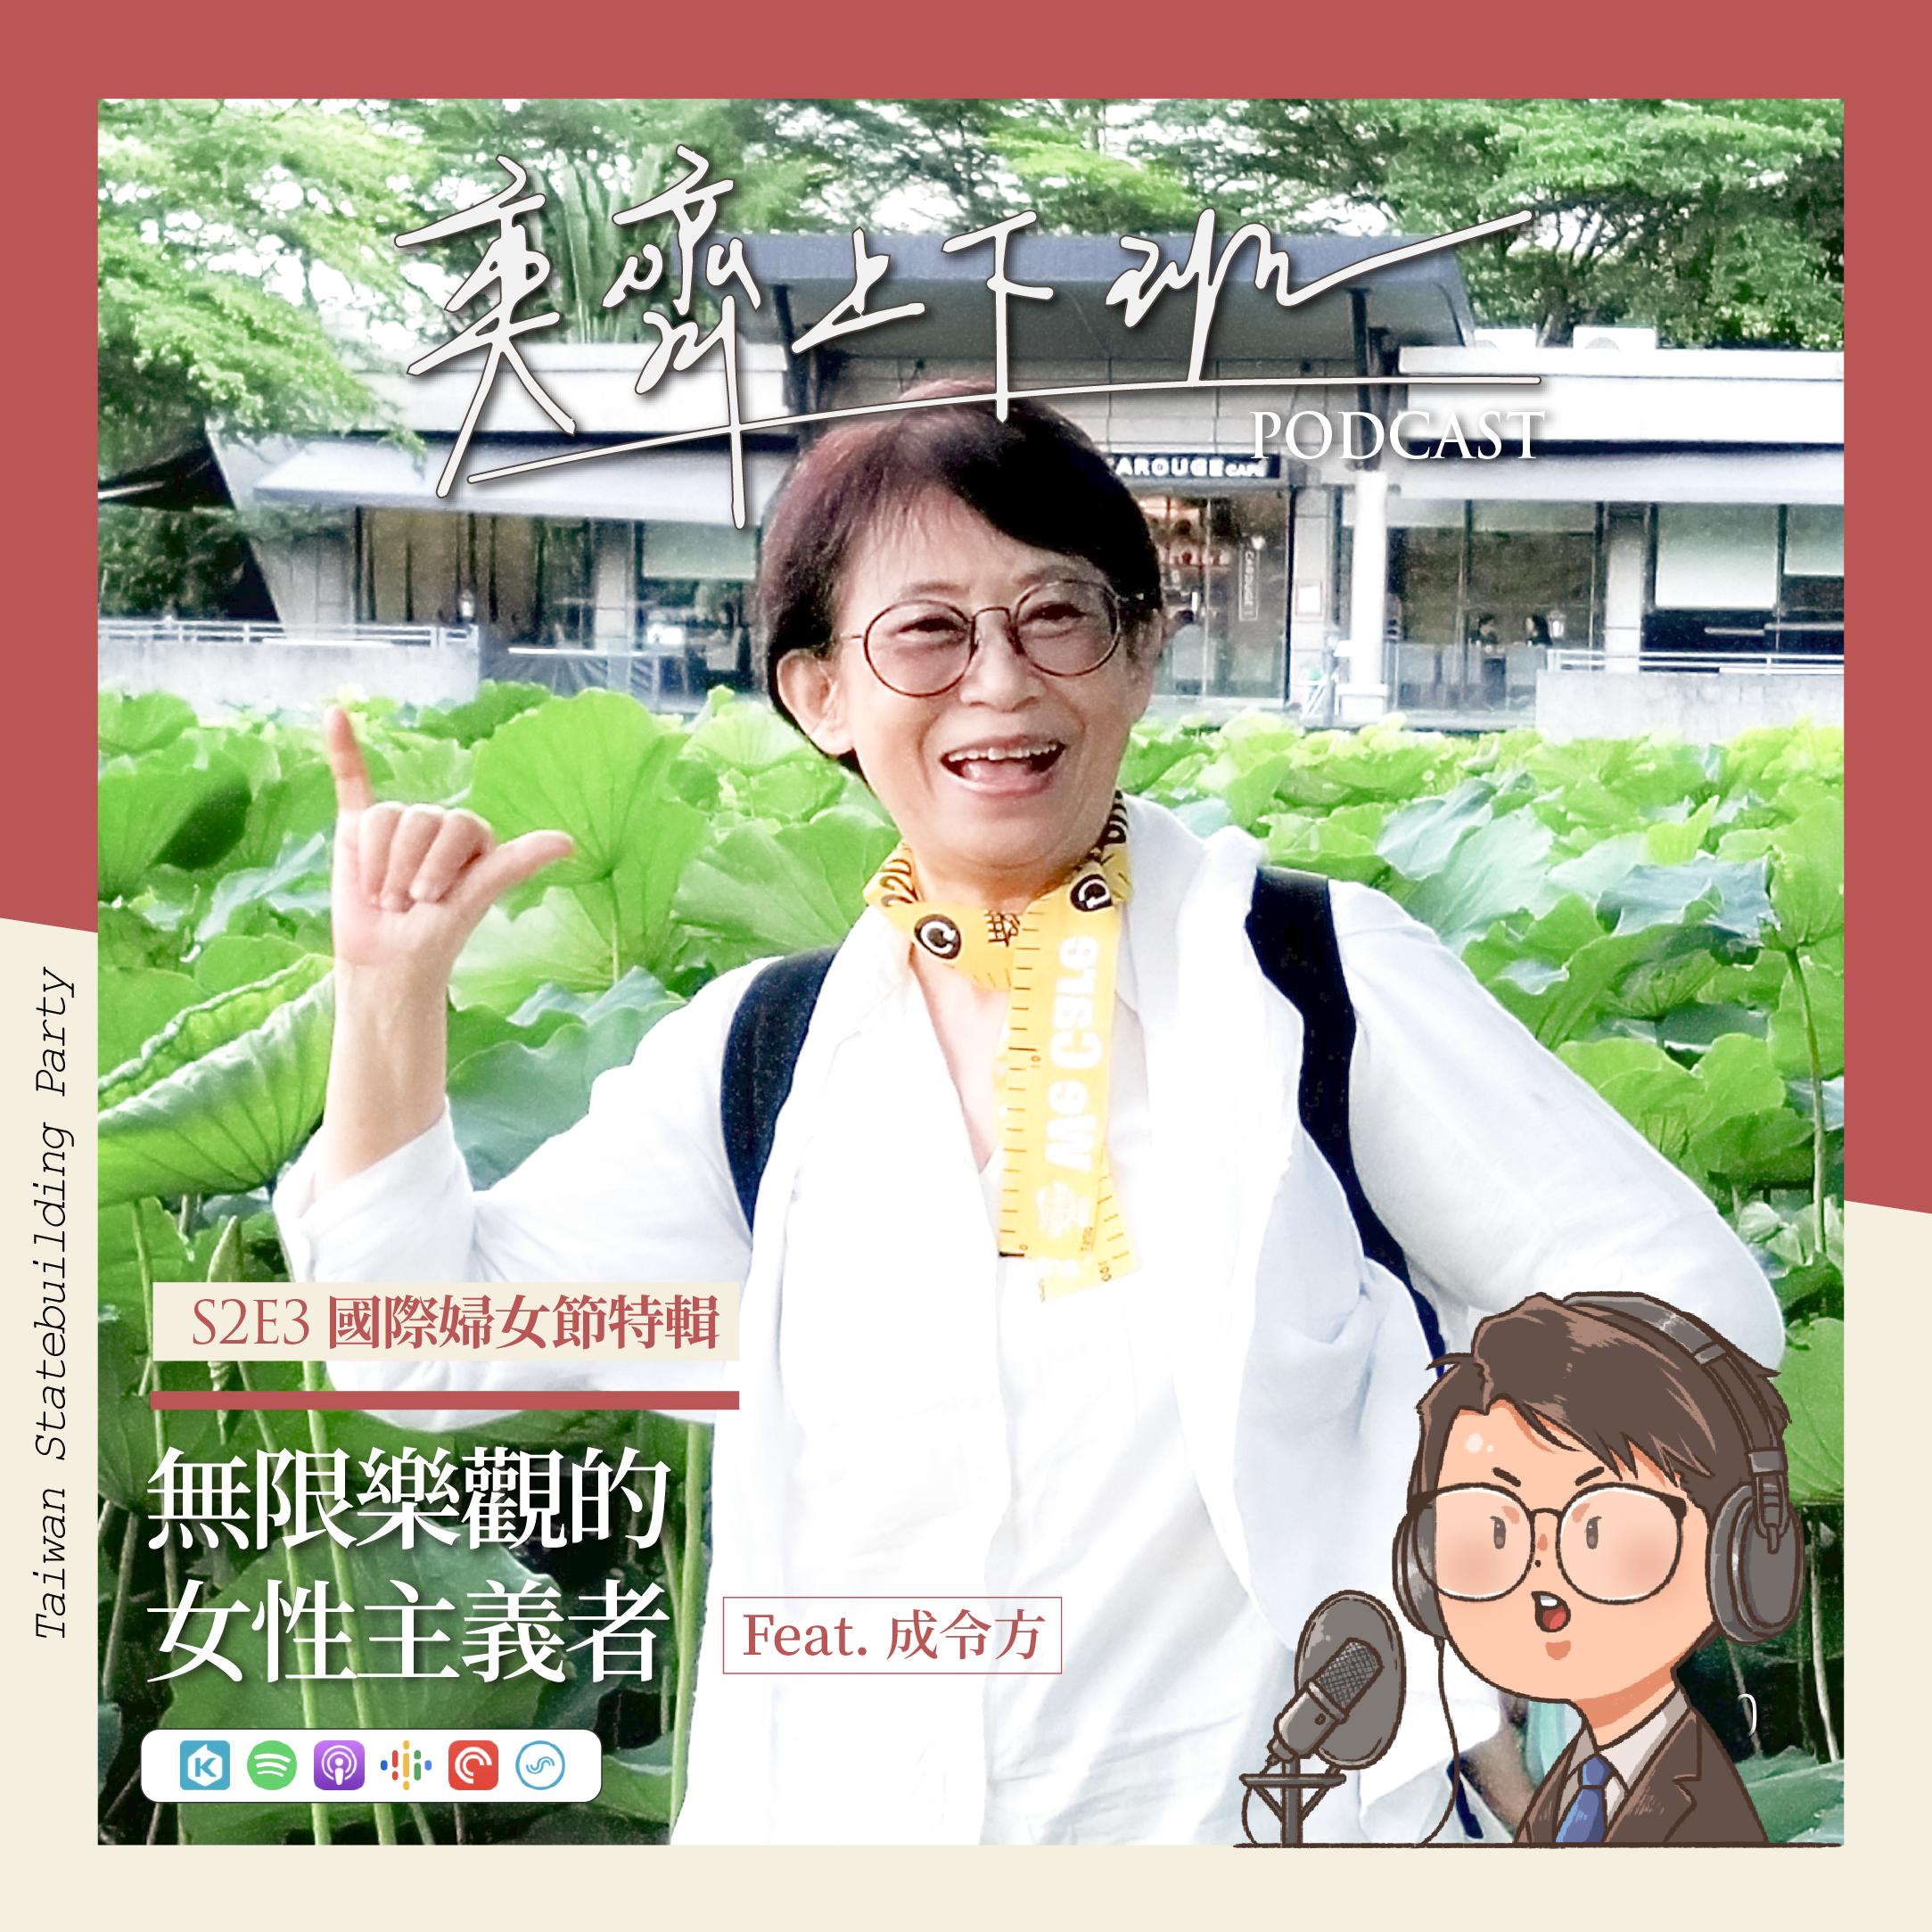 S2E3 國際婦女節特輯  無限樂觀的女性主義者  Feat. 成令方